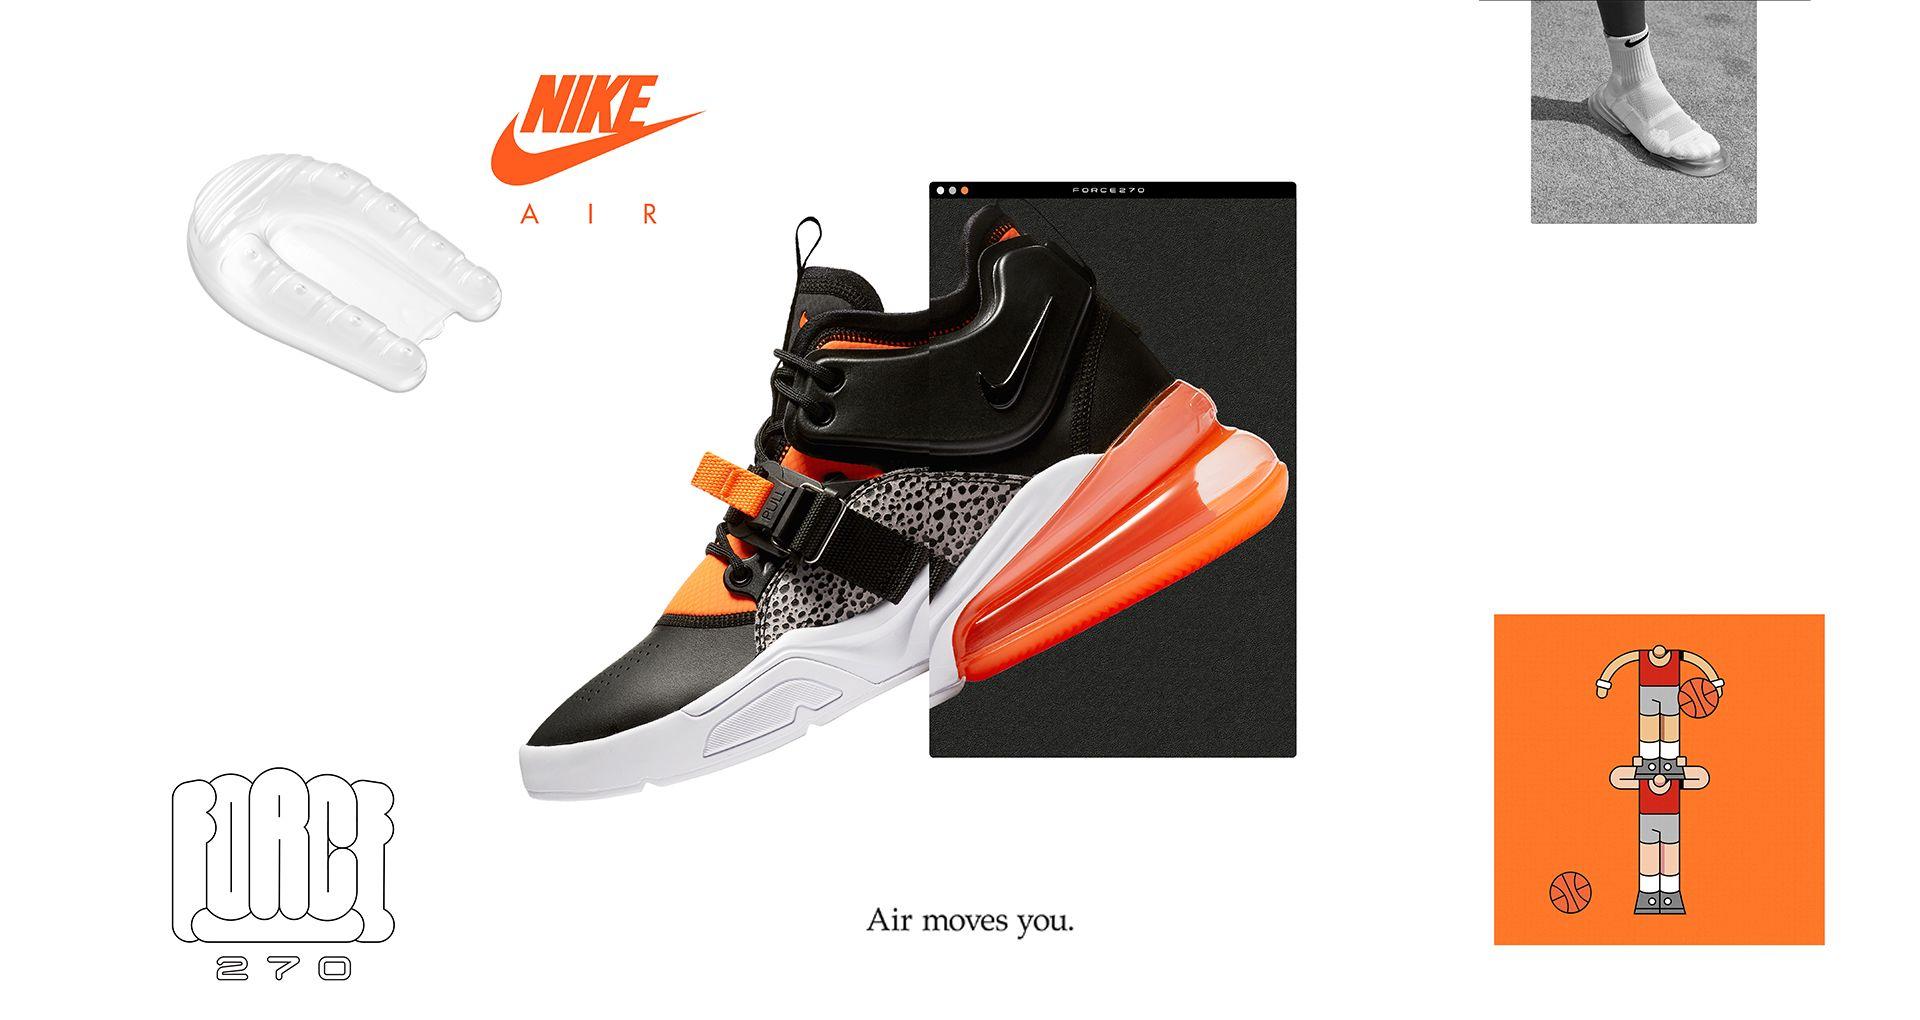 reputable site 788c4 43468 Nike Air Force 270 'Black & Hyper Crimson' Release Date. Nike+ SNKRS